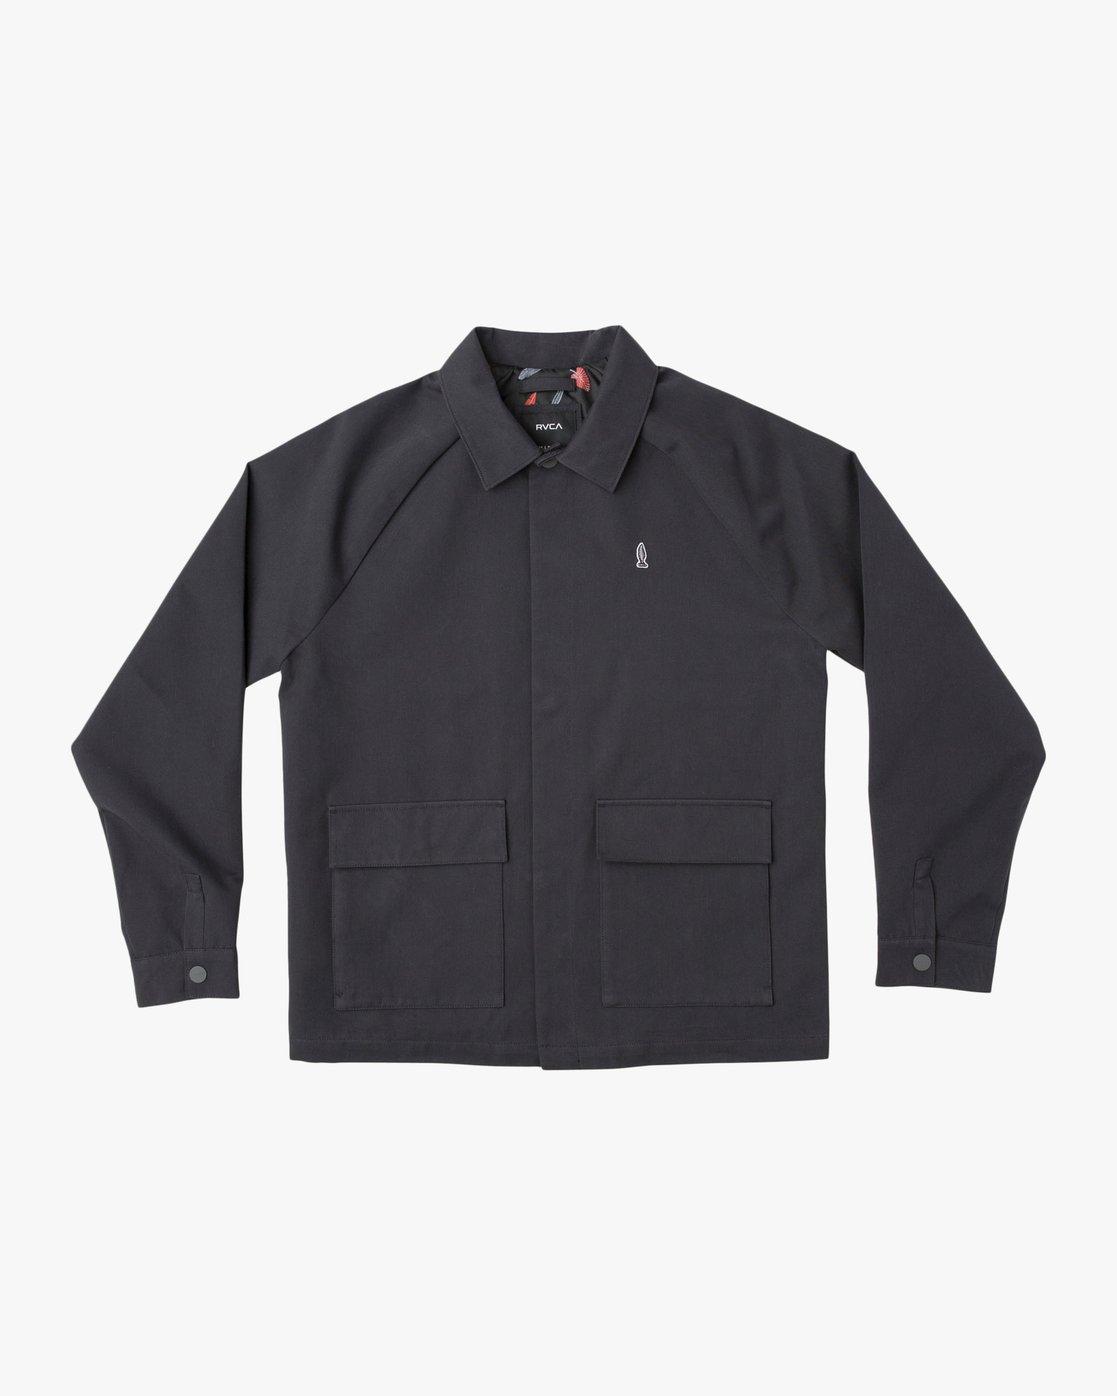 0 Gerrard Waist Cut Jacket Black N1JKRCRVP9 RVCA